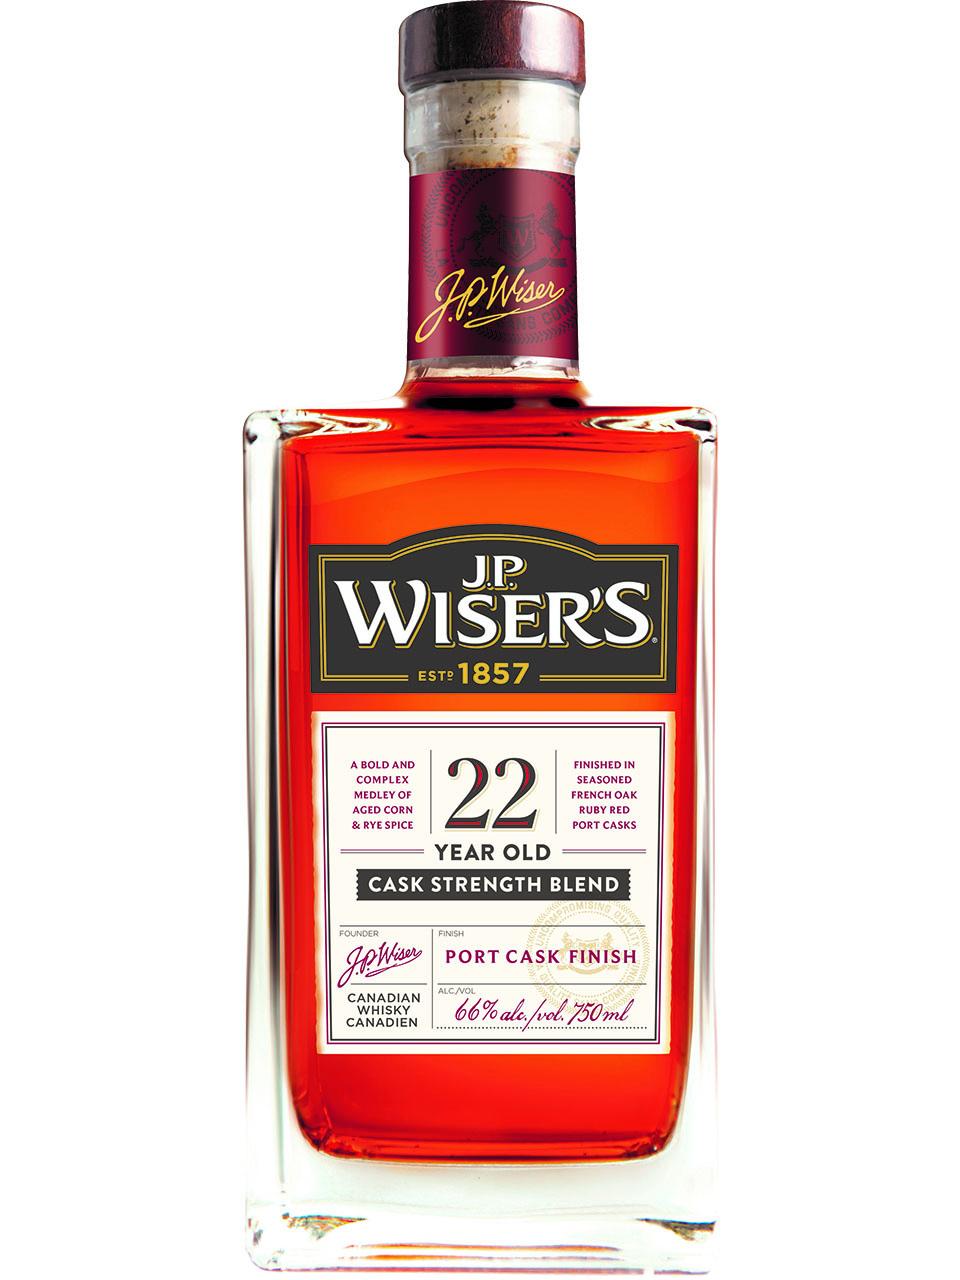 J.P. Wiser's Cask Strength Port Barrel Finish